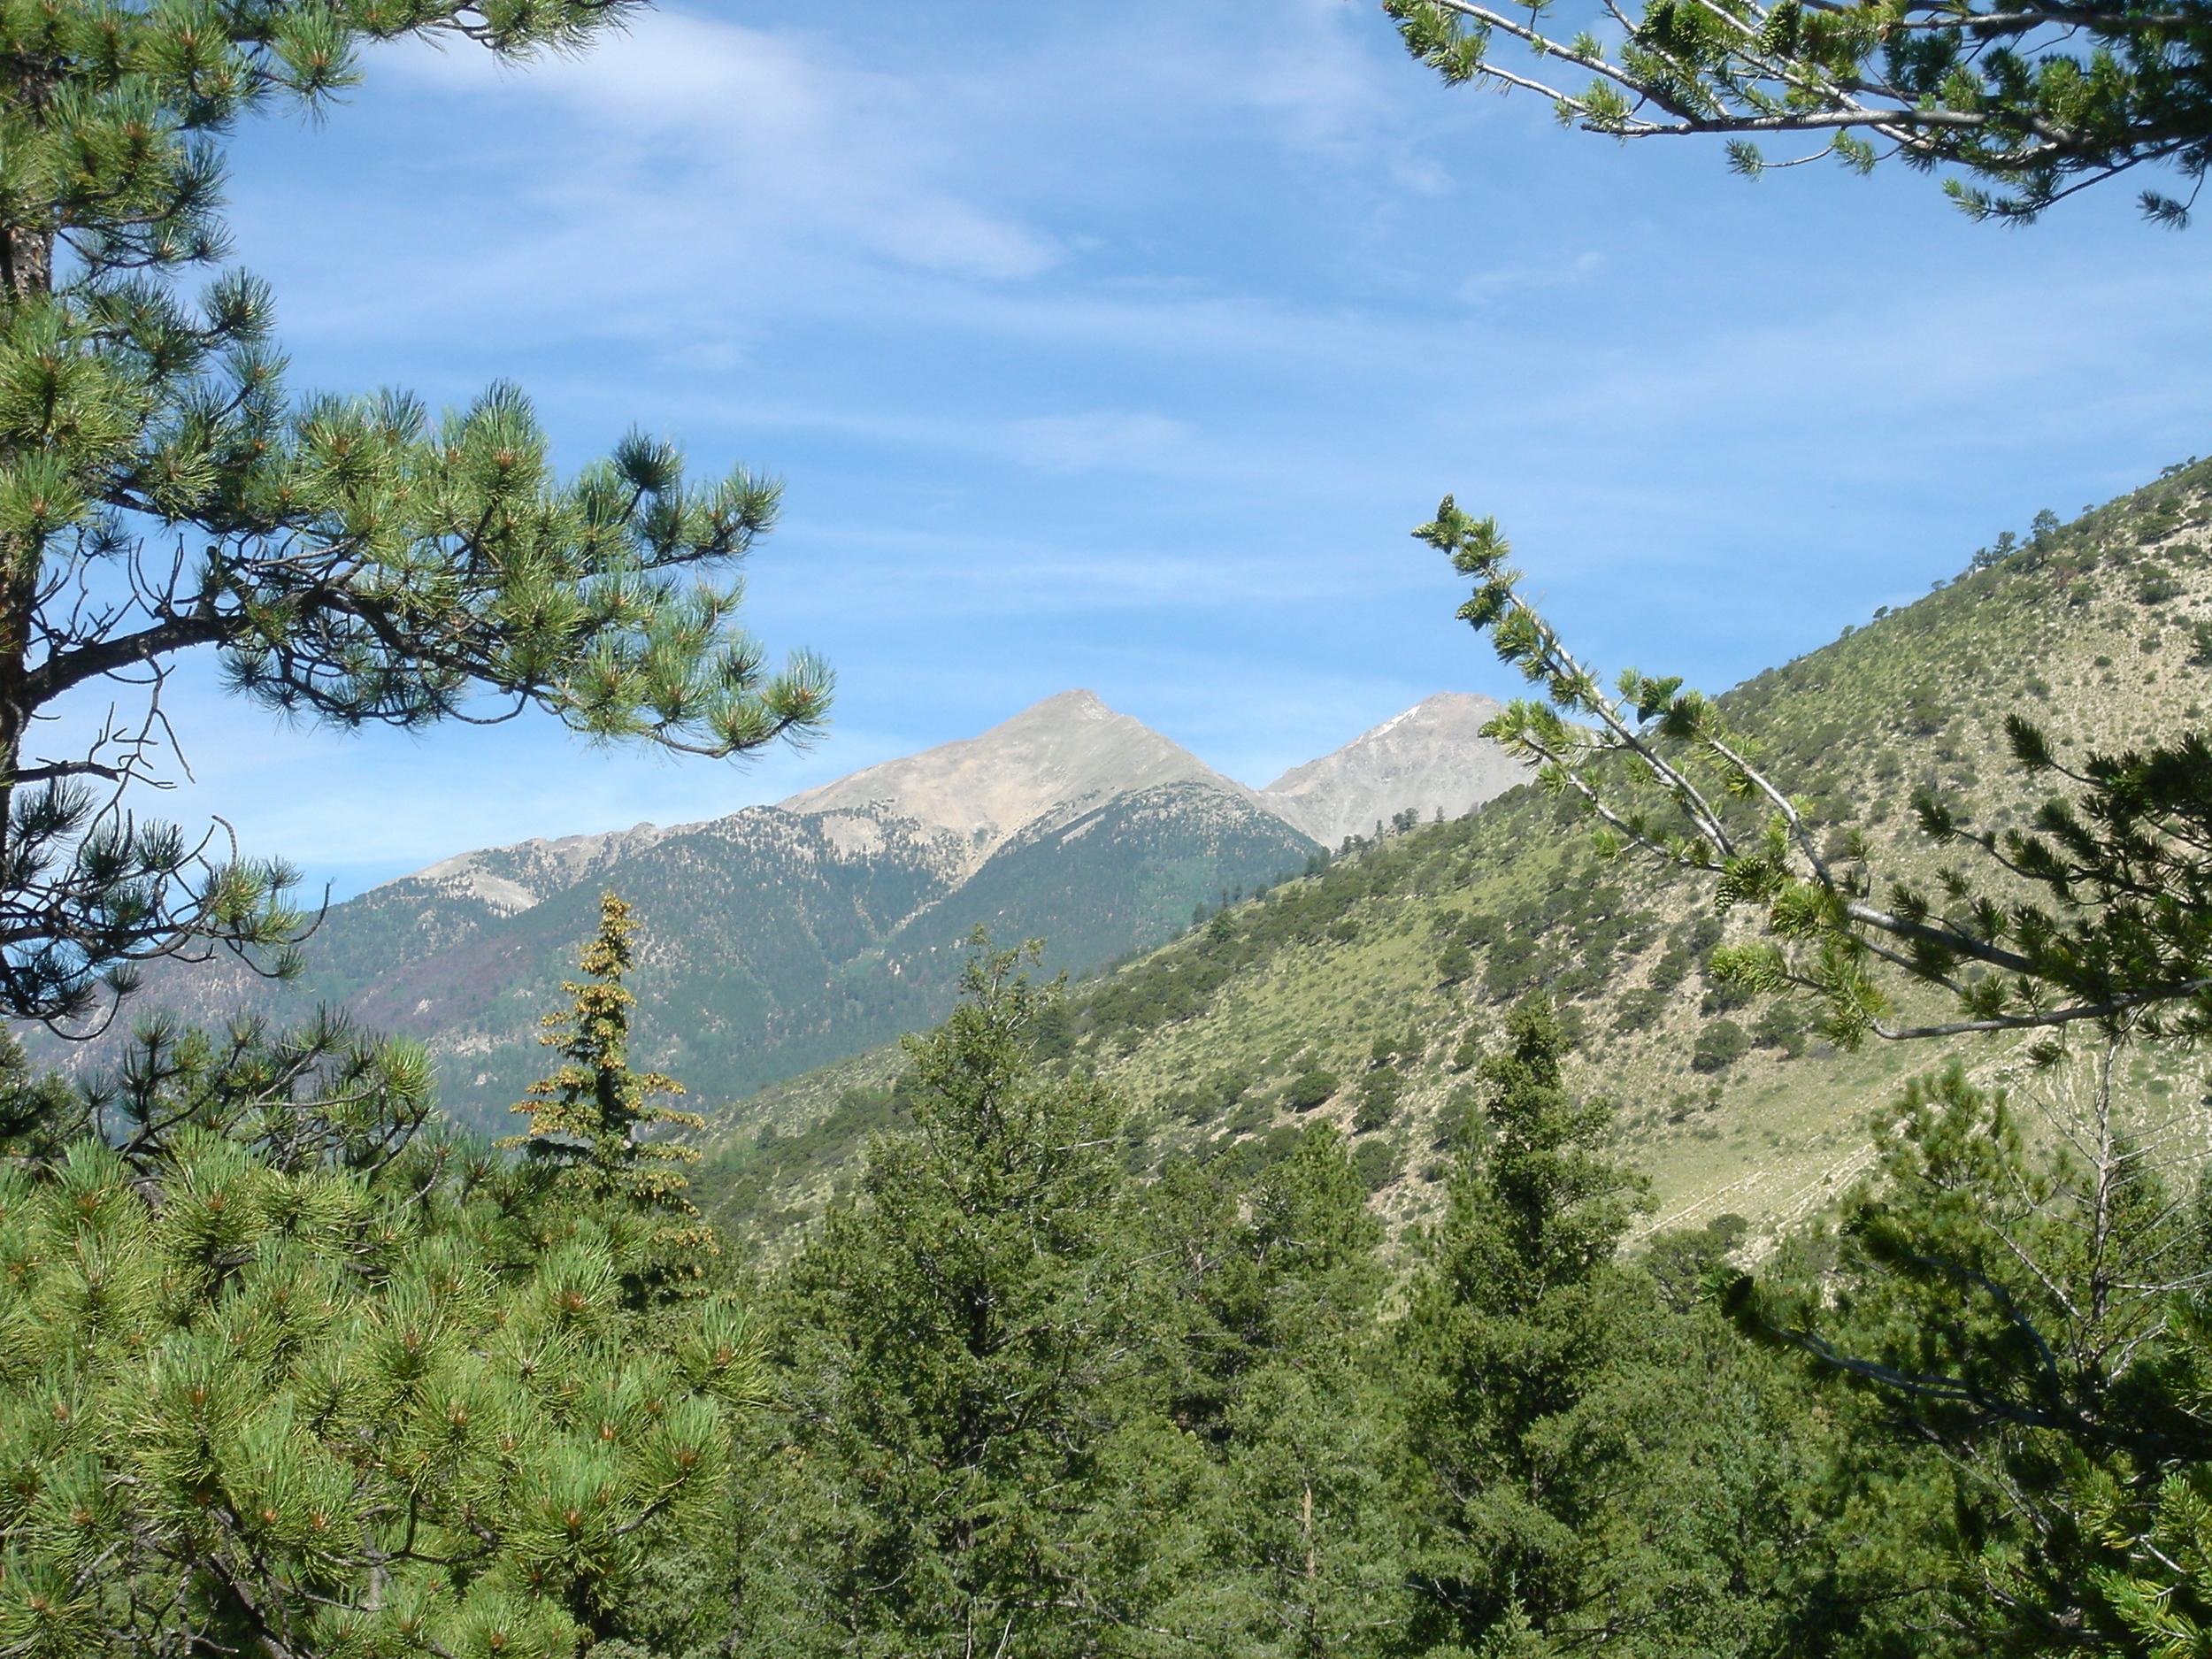 Walkers on the Colorado Trail enjoy views of several 14,000-foot peaks of the Collegiate Range of the Colorado Rockies.